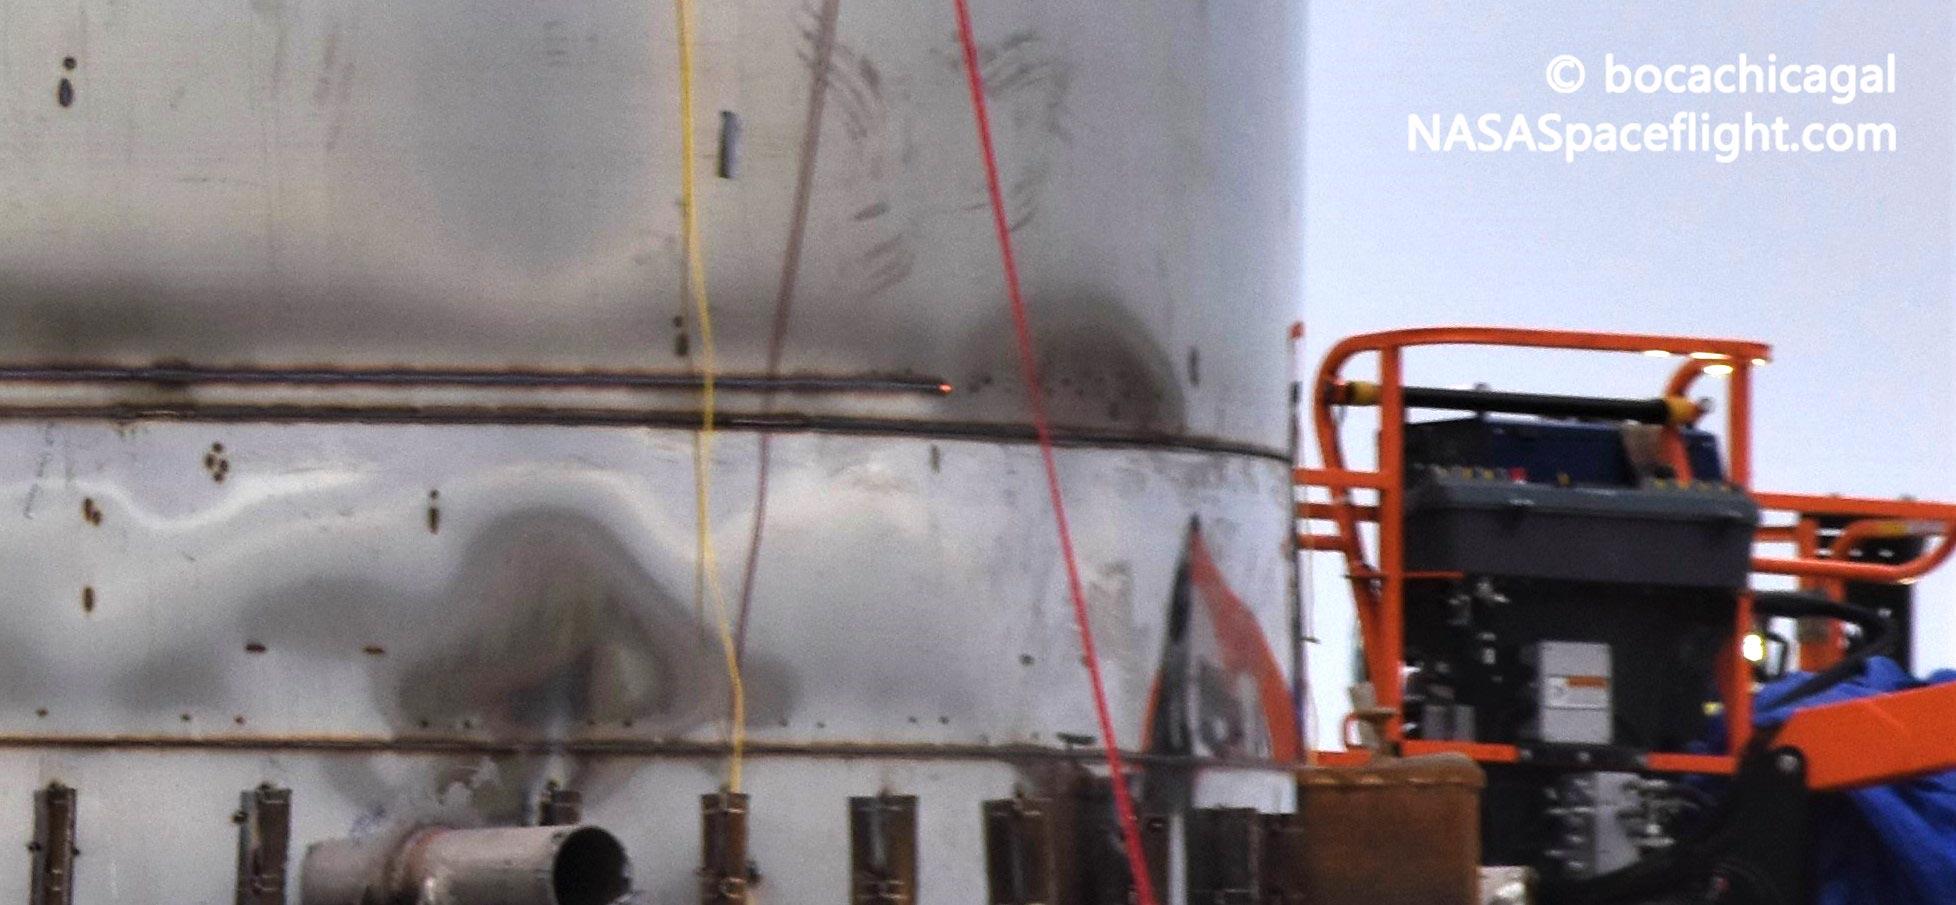 Starship Boca Chica 010920 (NASASpaceflight – bocachicagal) test tank 2 crop